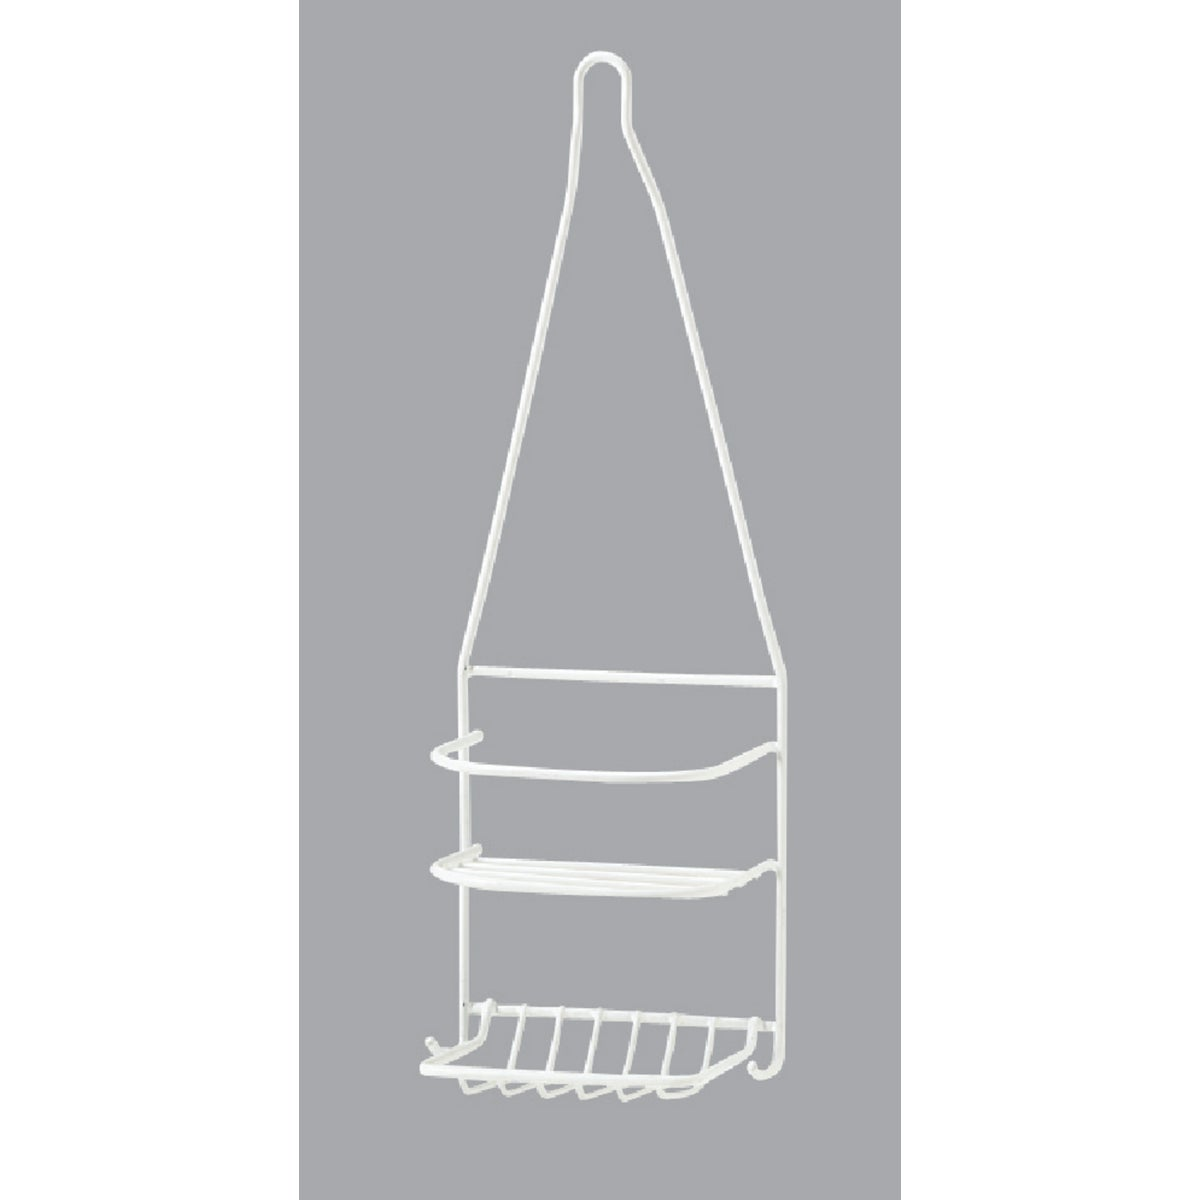 SMALL SHOWER ORGANIZER - 21510302.36 by Homz Products  Bath